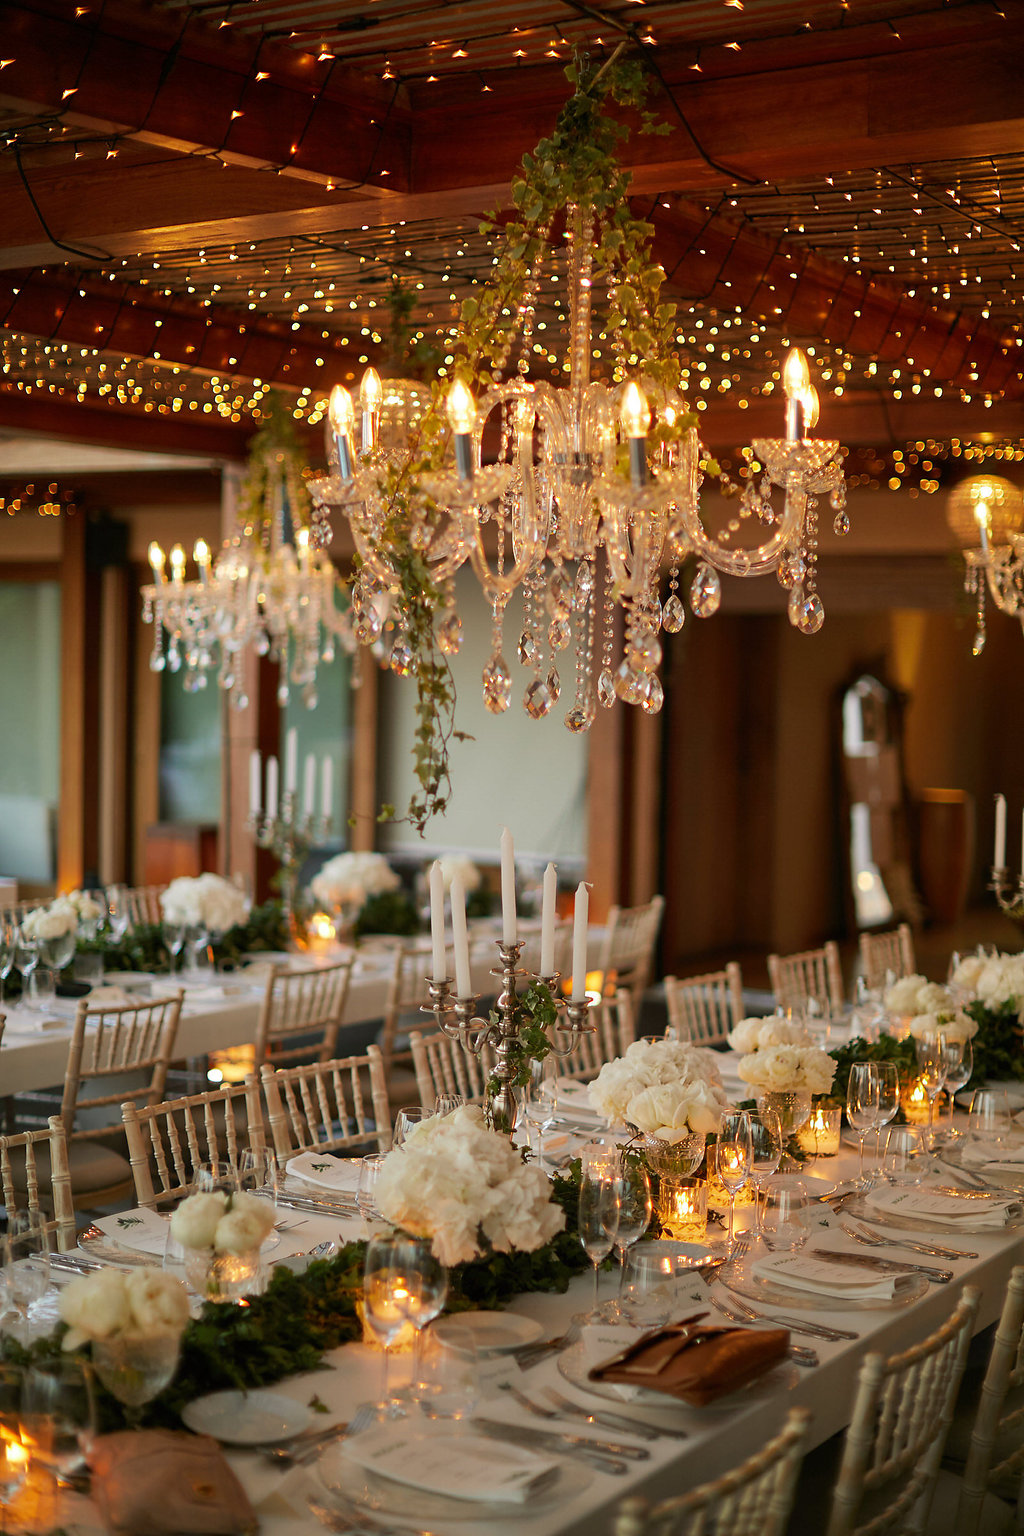 romantic fairy light weddings - photo by Sotiris Tsakanikas http://ruffledblog.com/chic-sunset-wedding-on-the-athens-riviera